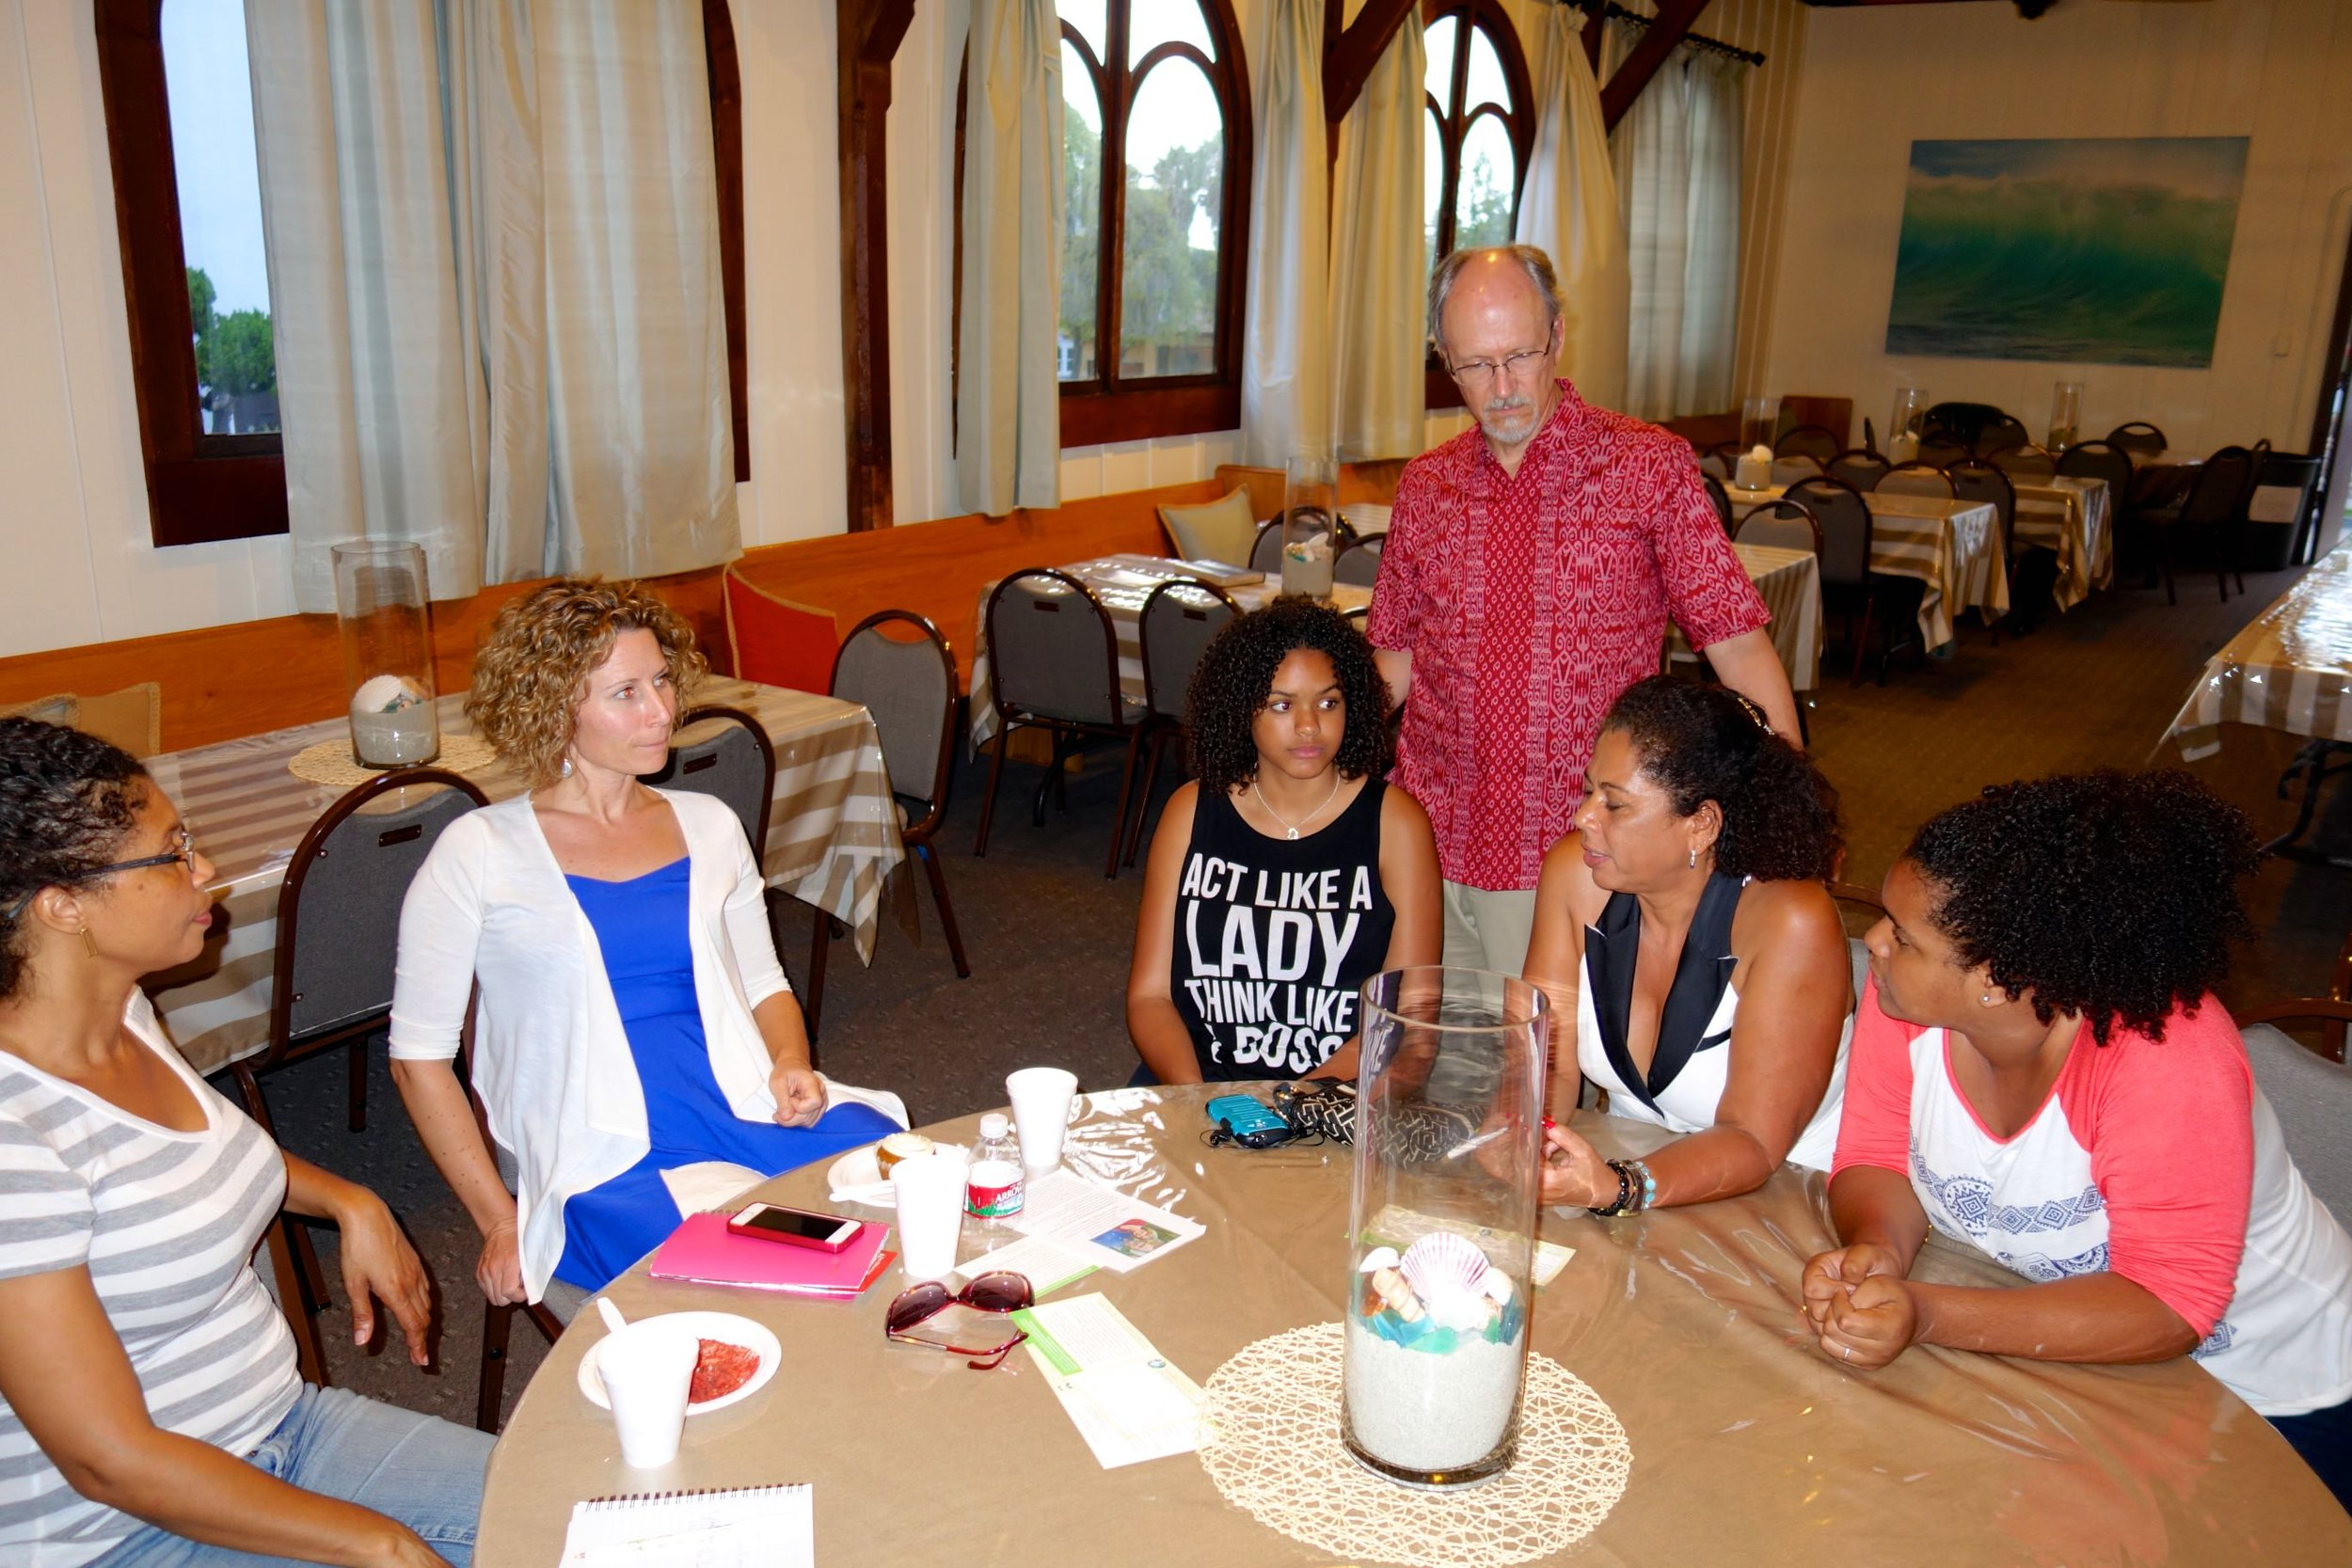 2015-08-30-La-Jolla-CA-La-Jolla-Christian-Fellowship-Workshop-Borquist-9747.jpg